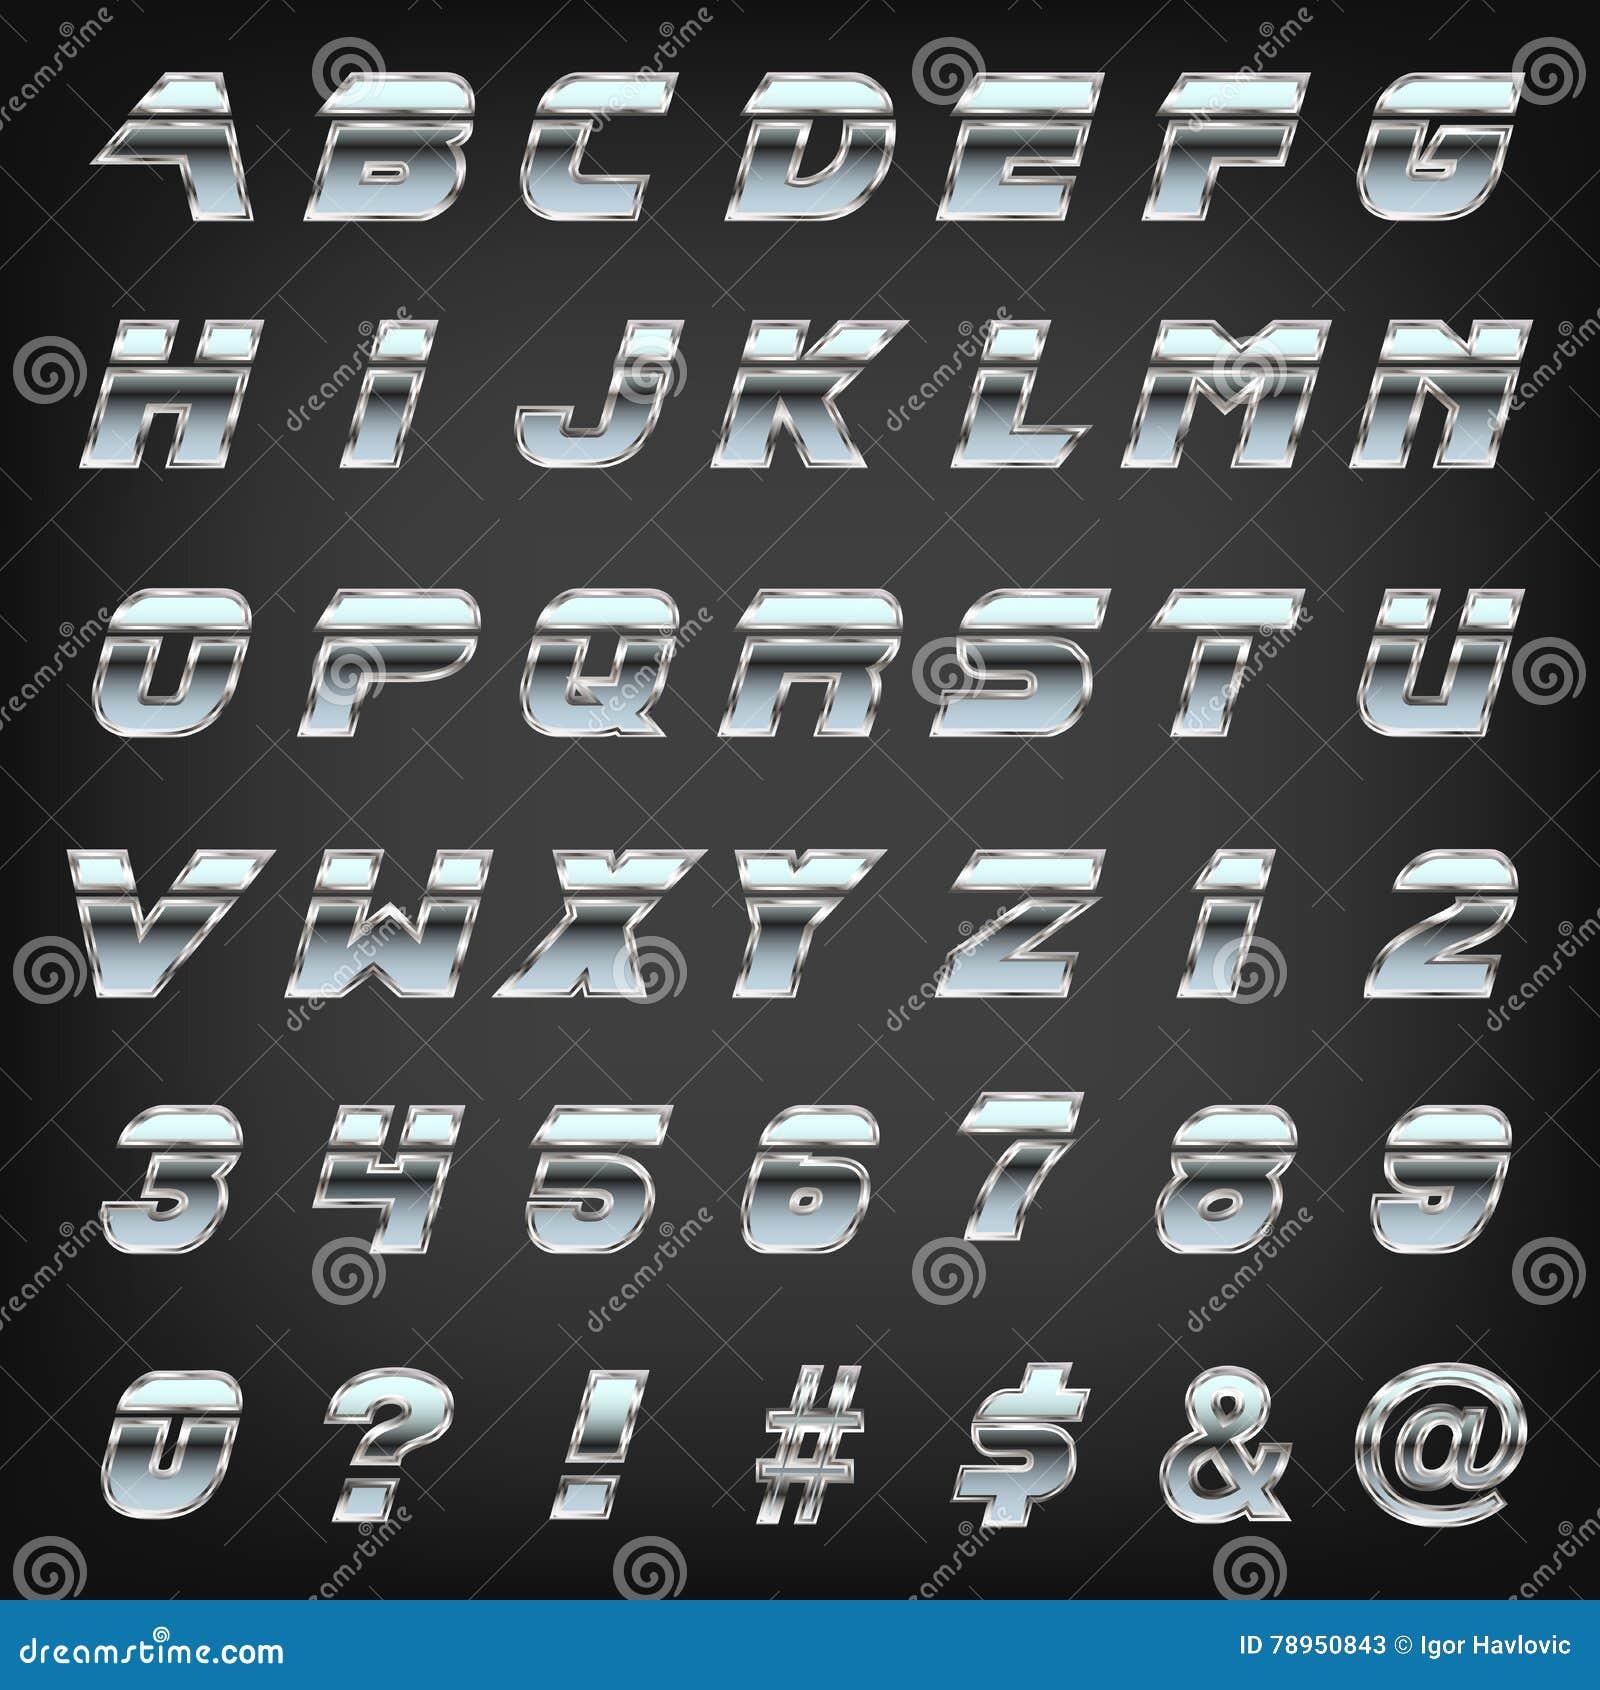 Gray Alphabet Font: Metallic Sharp Edged Font Typeset On Grey Background